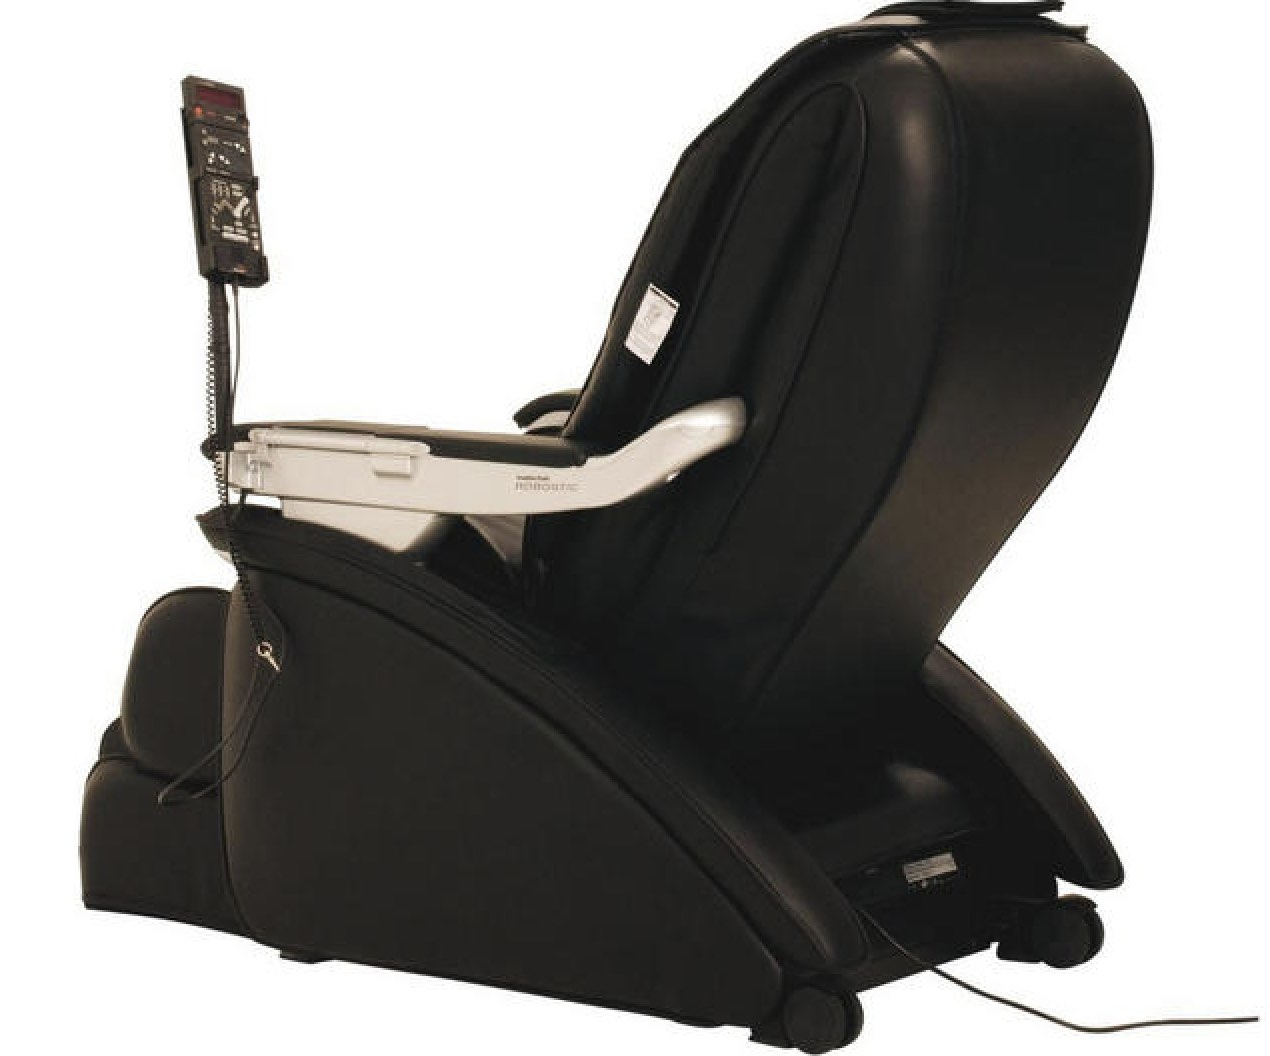 Fauteuil de Massage Inada D6 Robostic 6